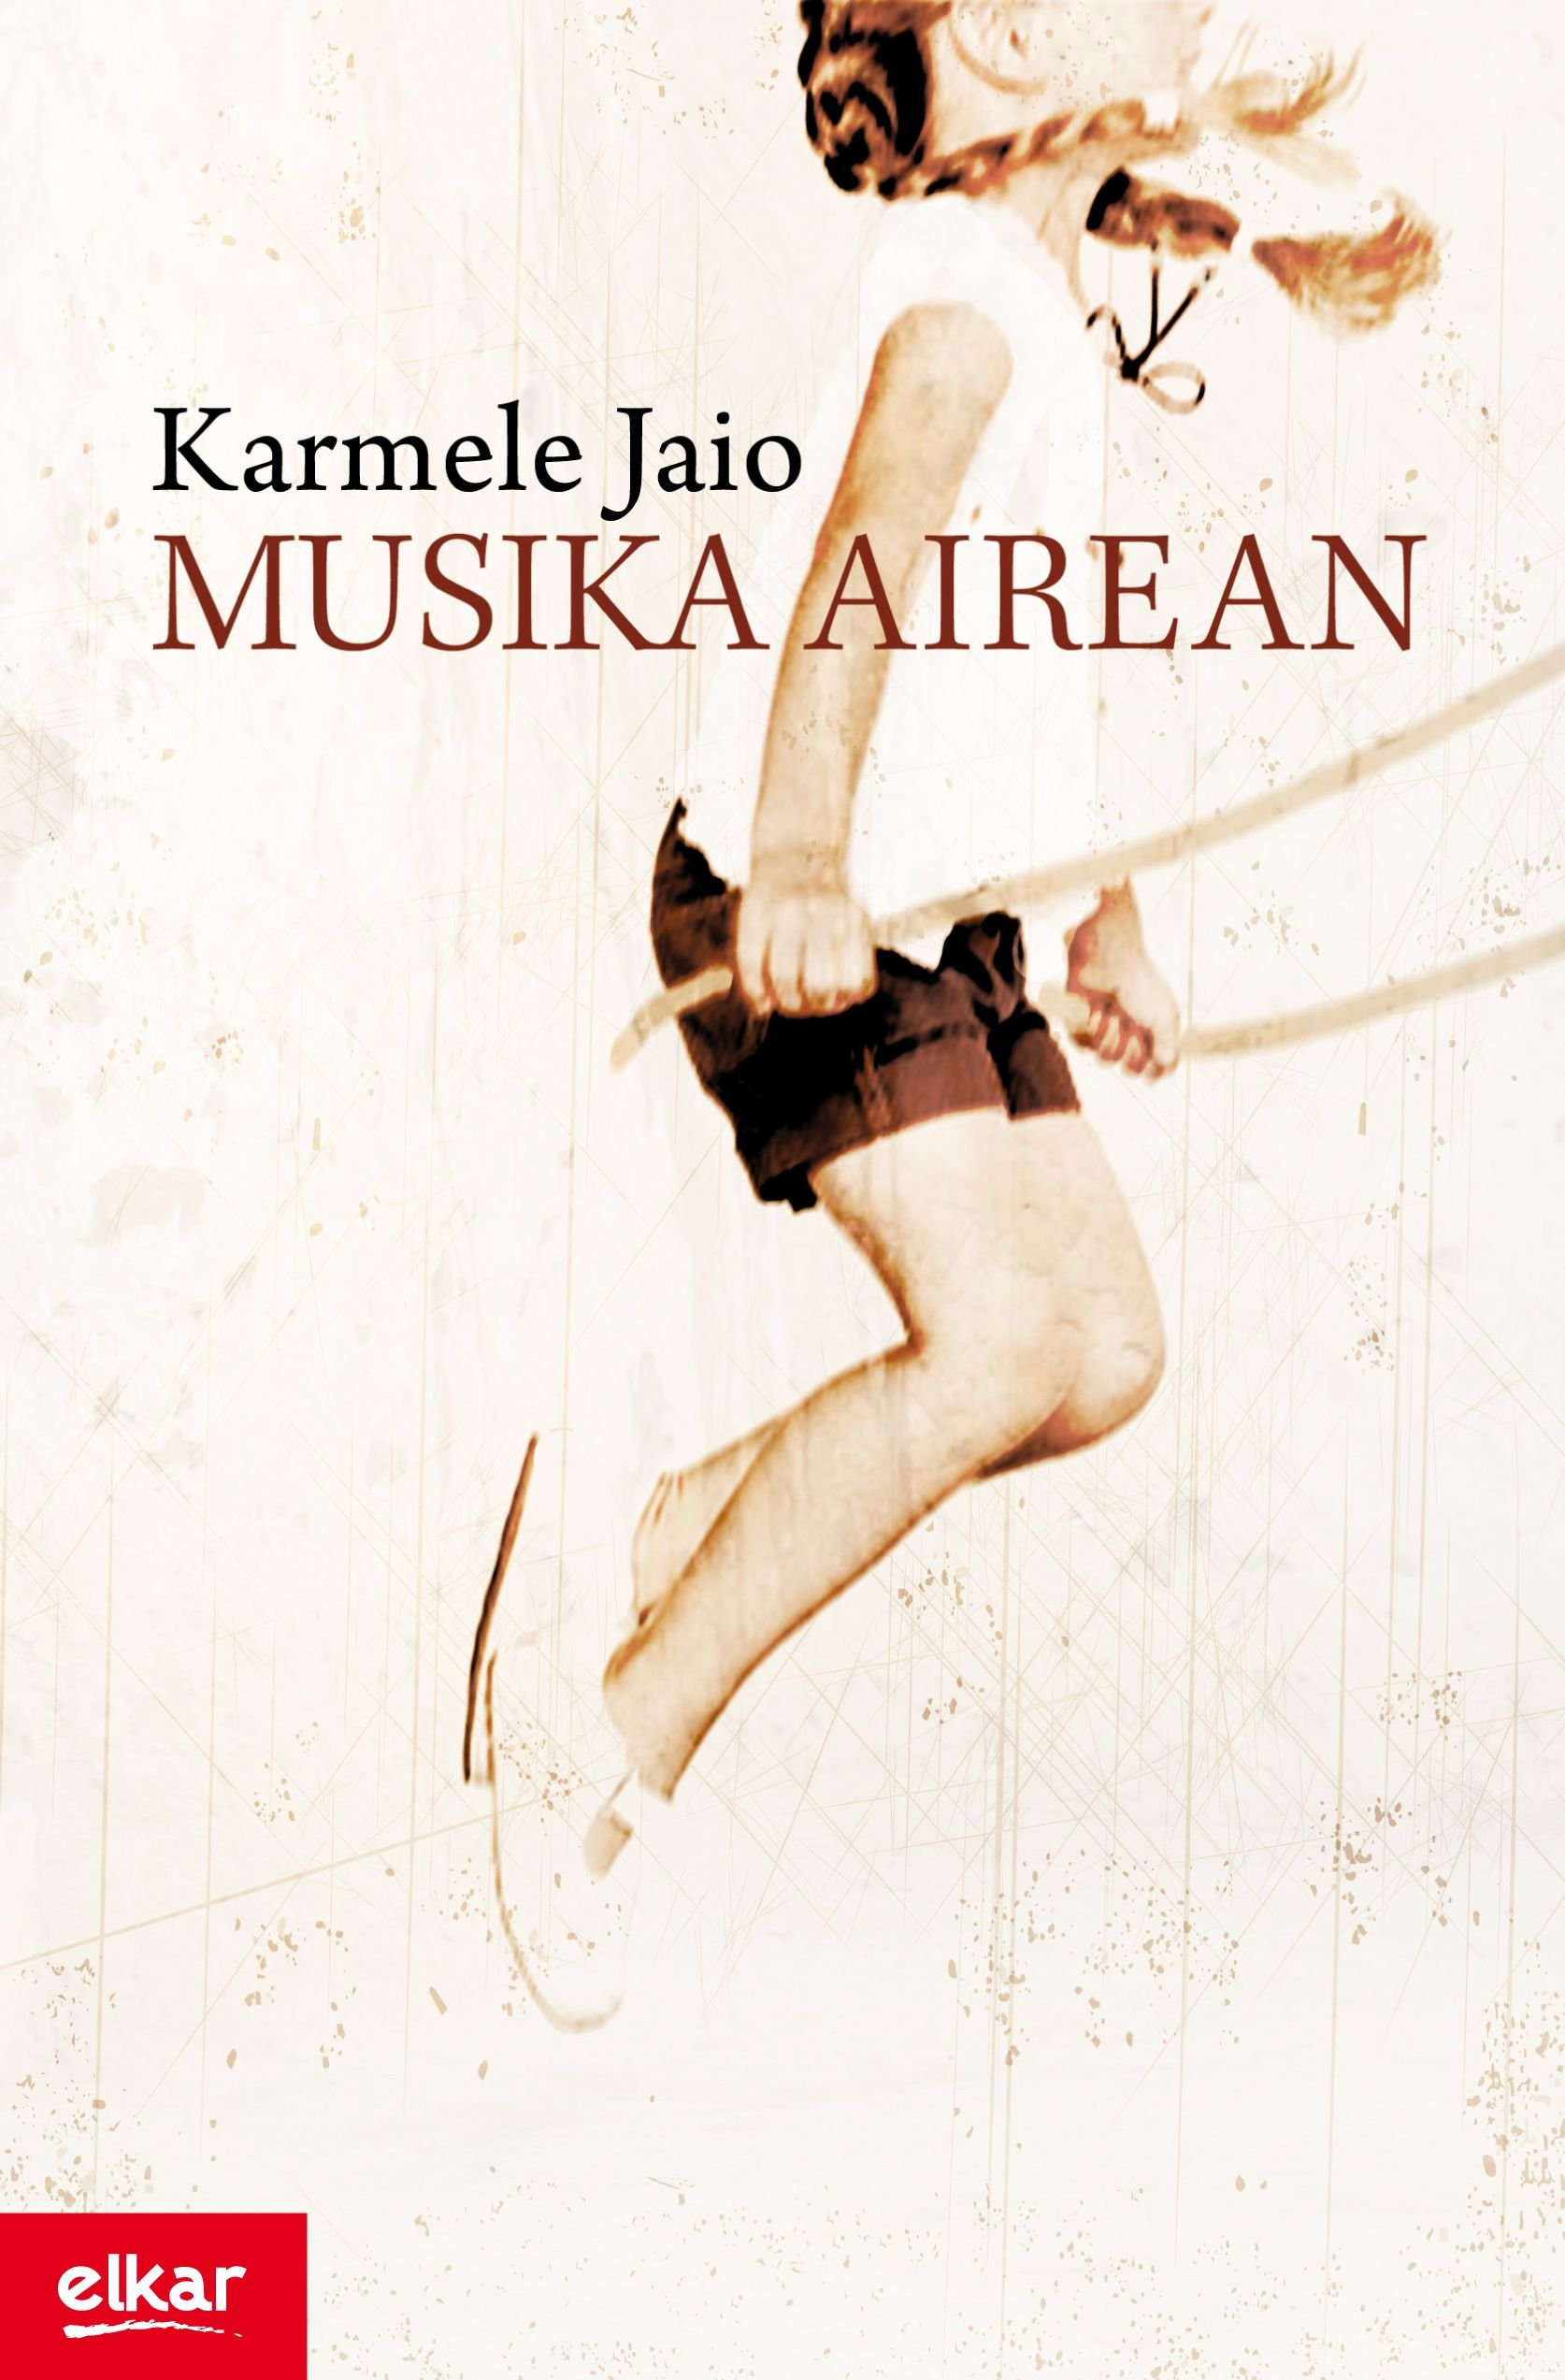 Musika airean (Literatura) (Euskera) Tapa blanda – 30 sep 2009 Karmele Jaio Eiguren Elkarlanean S.L. 8497837320